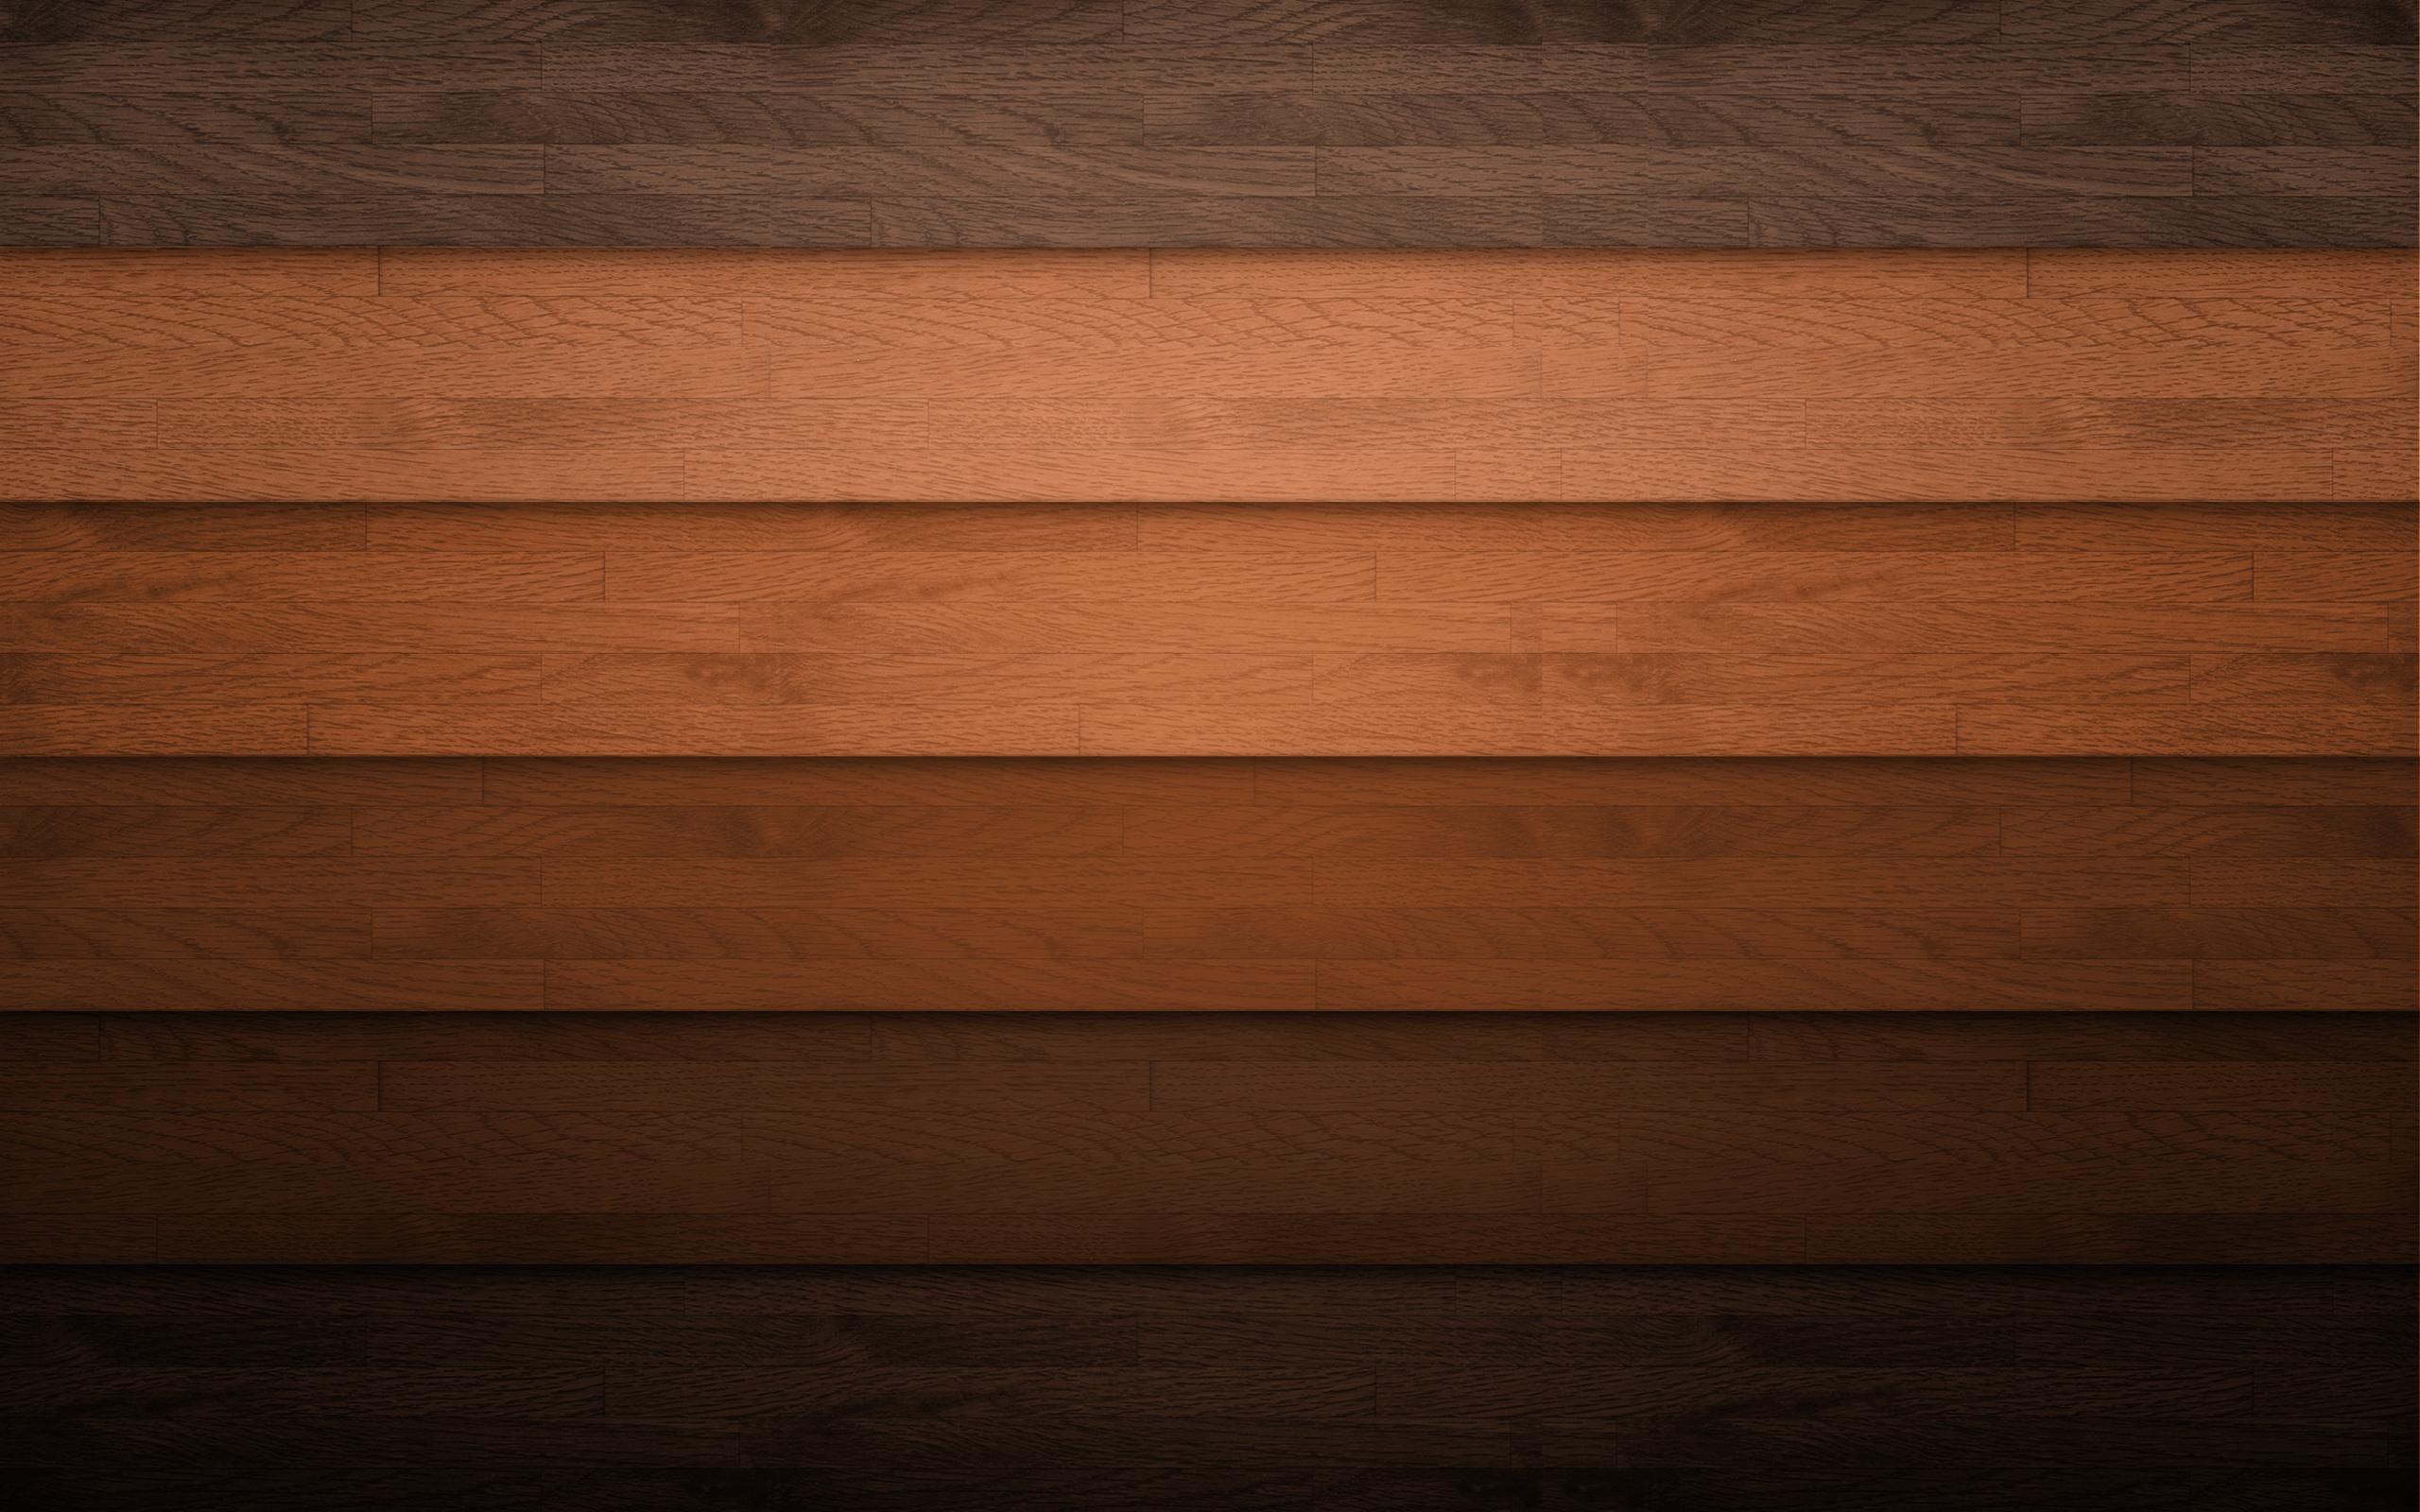 brown wood   Desktop Wallpaper HD Wallpapers Download and New 3D 2560x1600